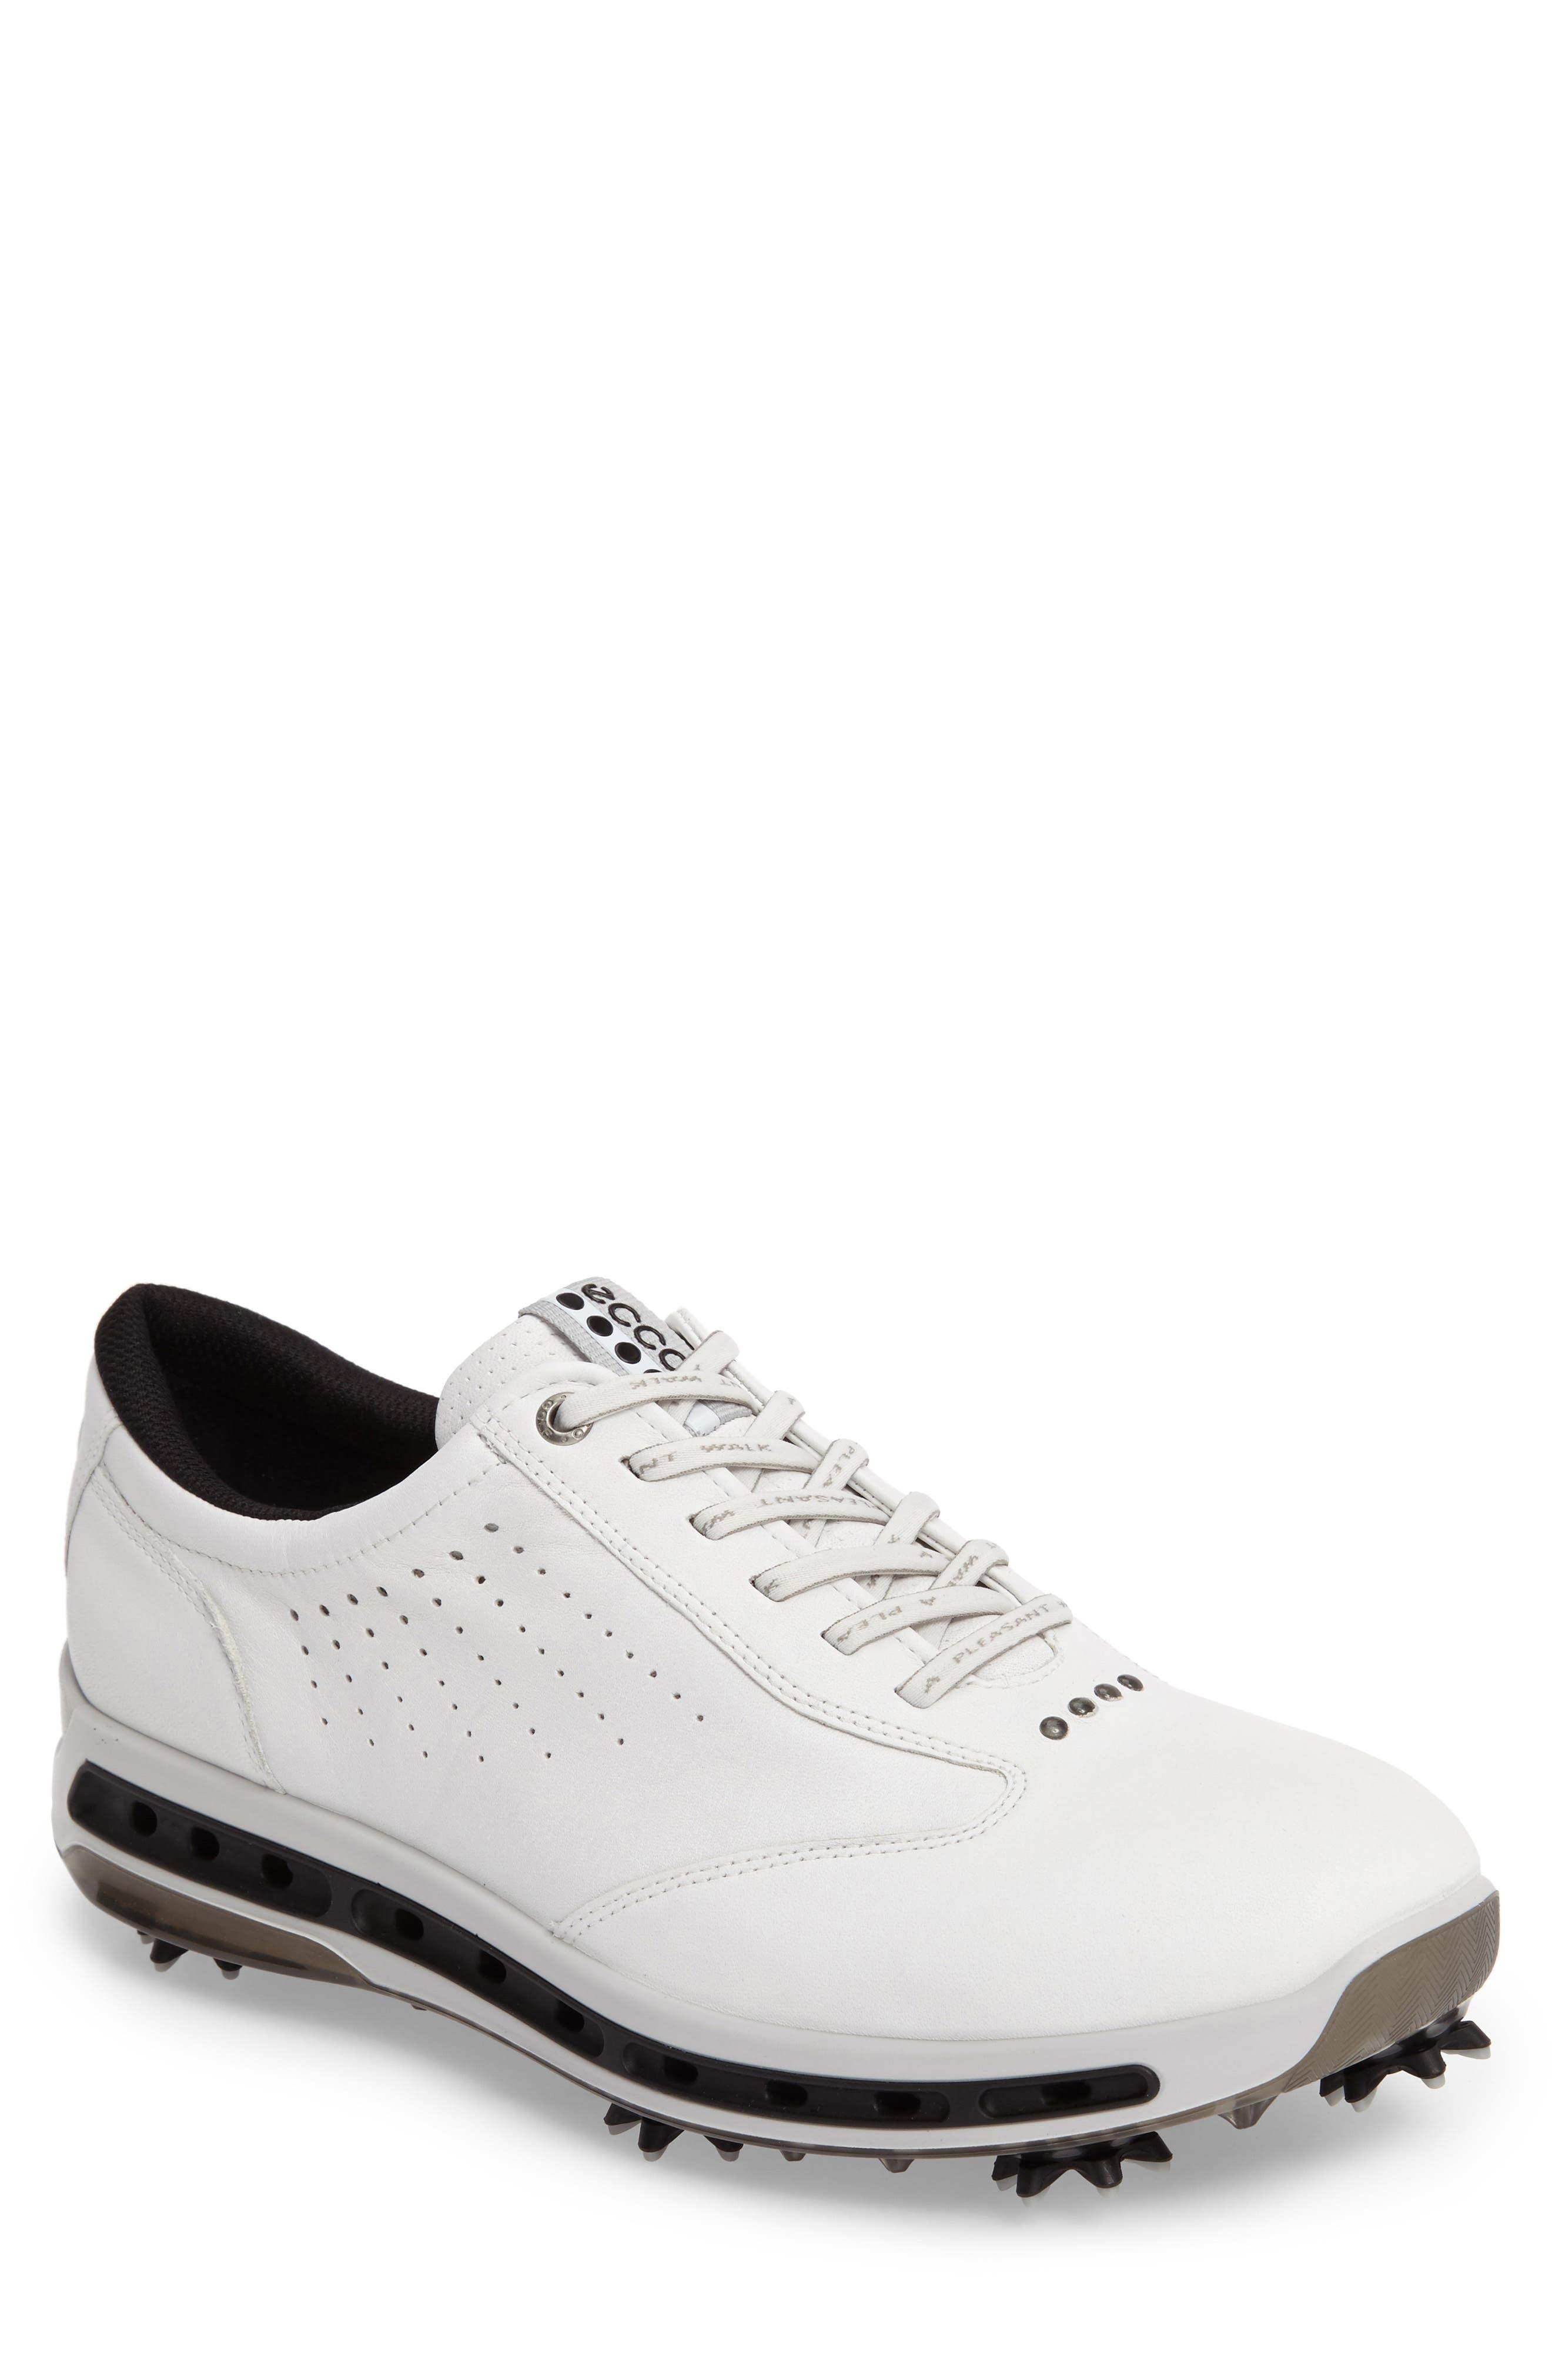 Cool GTX Golf Shoe,                         Main,                         color, White/ Black